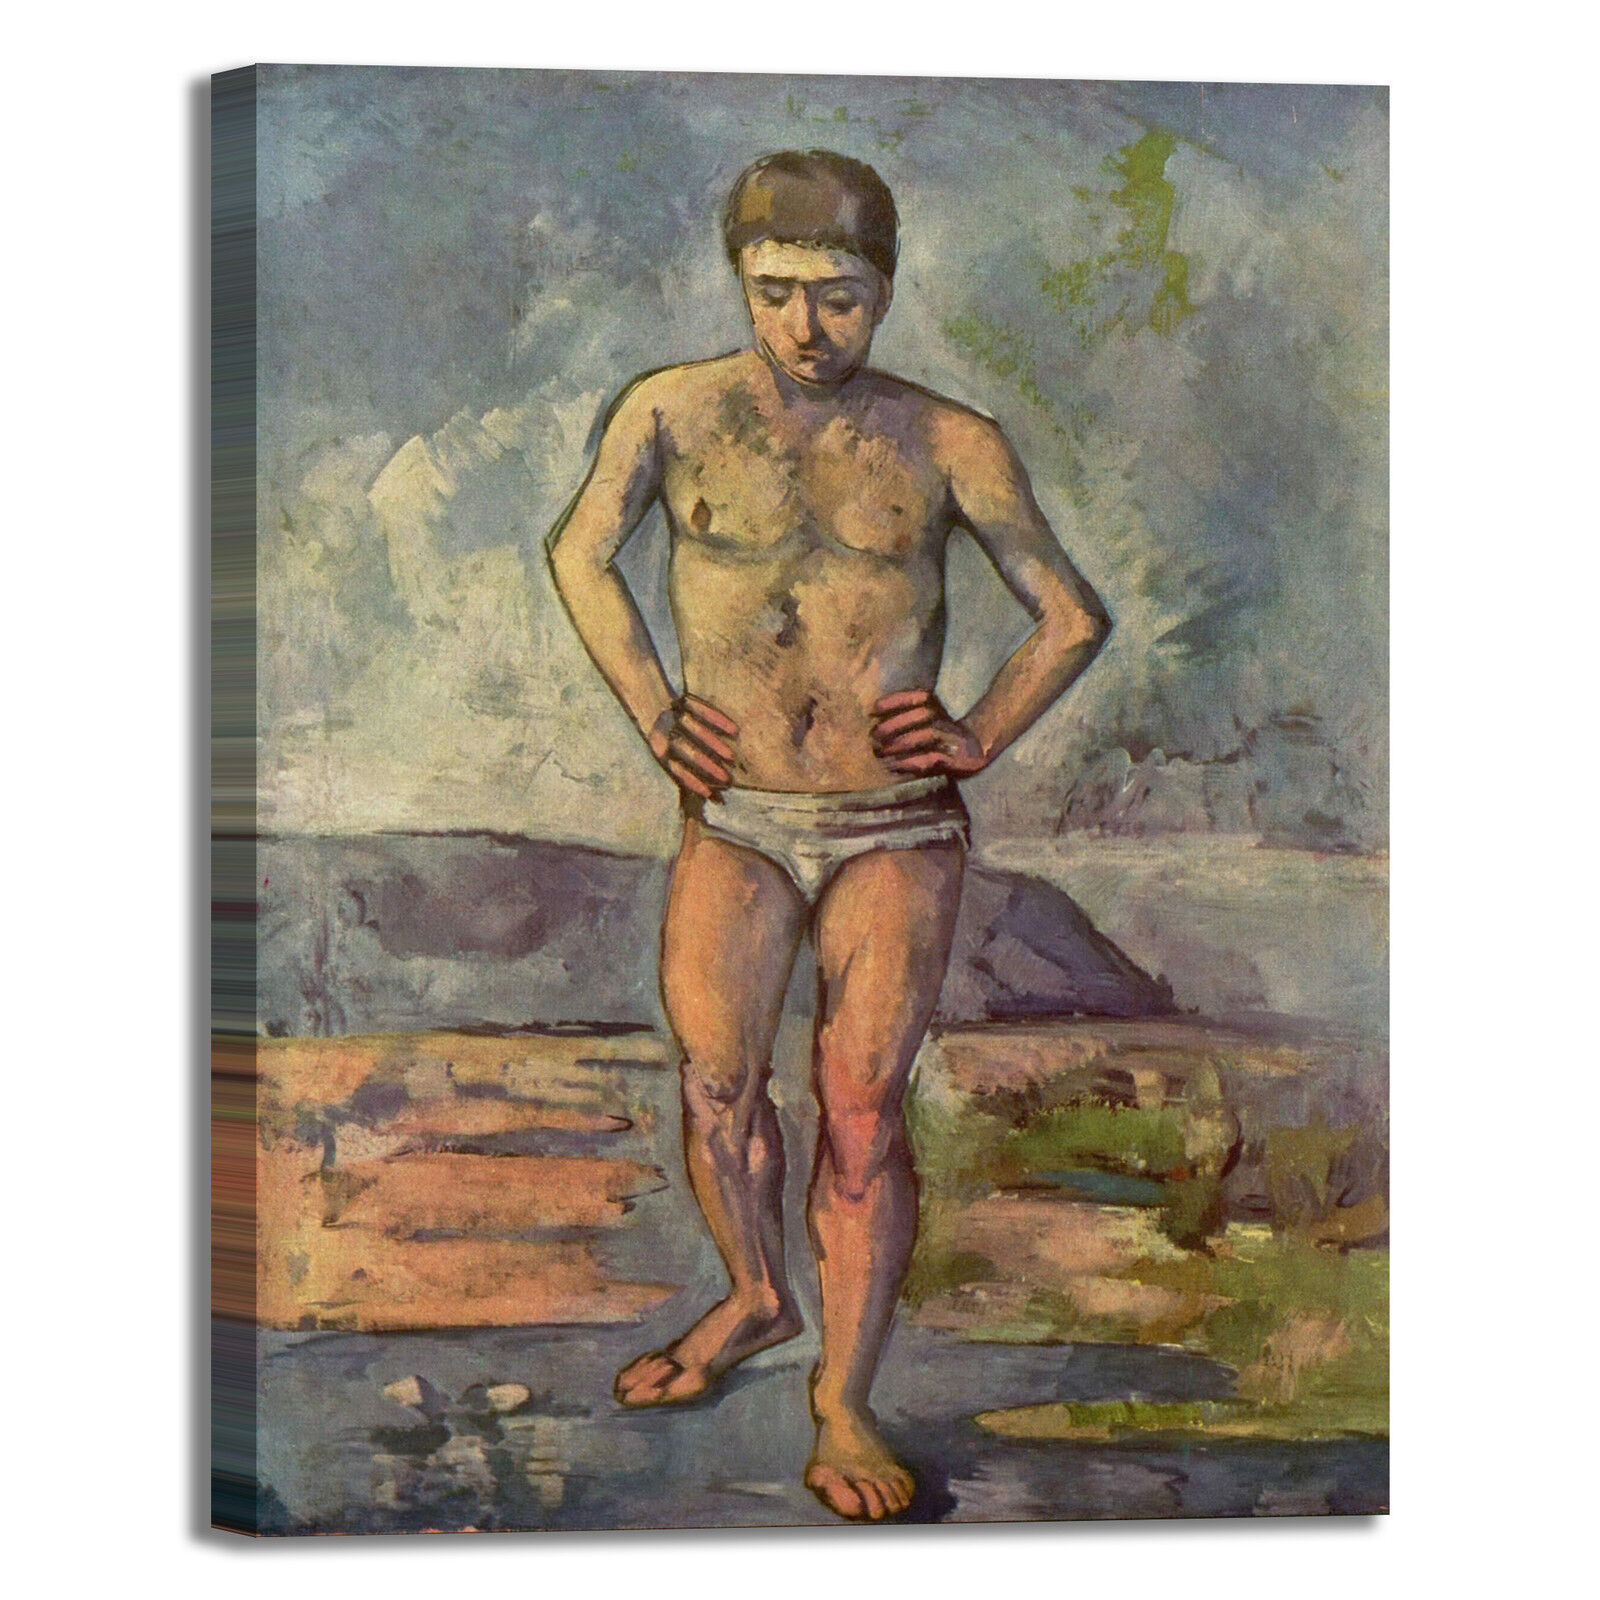 Cezanne bagnanti 4 design quadro stampa tela dipinto con telaio arrossoo casa